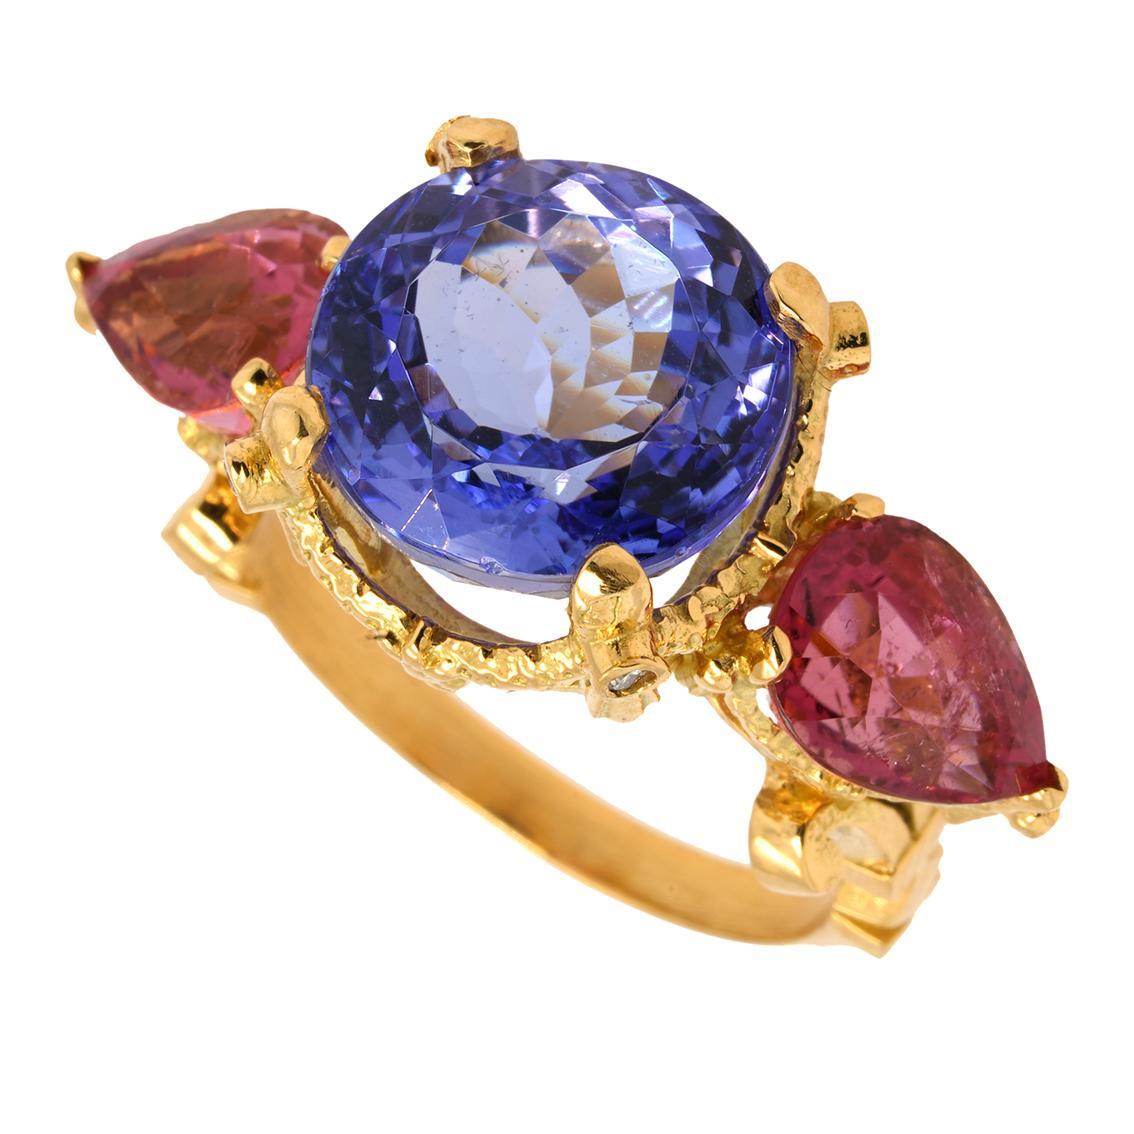 Roses of Heliogabalus Ring 18Kt Yellow Gold Tanzanite, Tourmalines, Diamonds